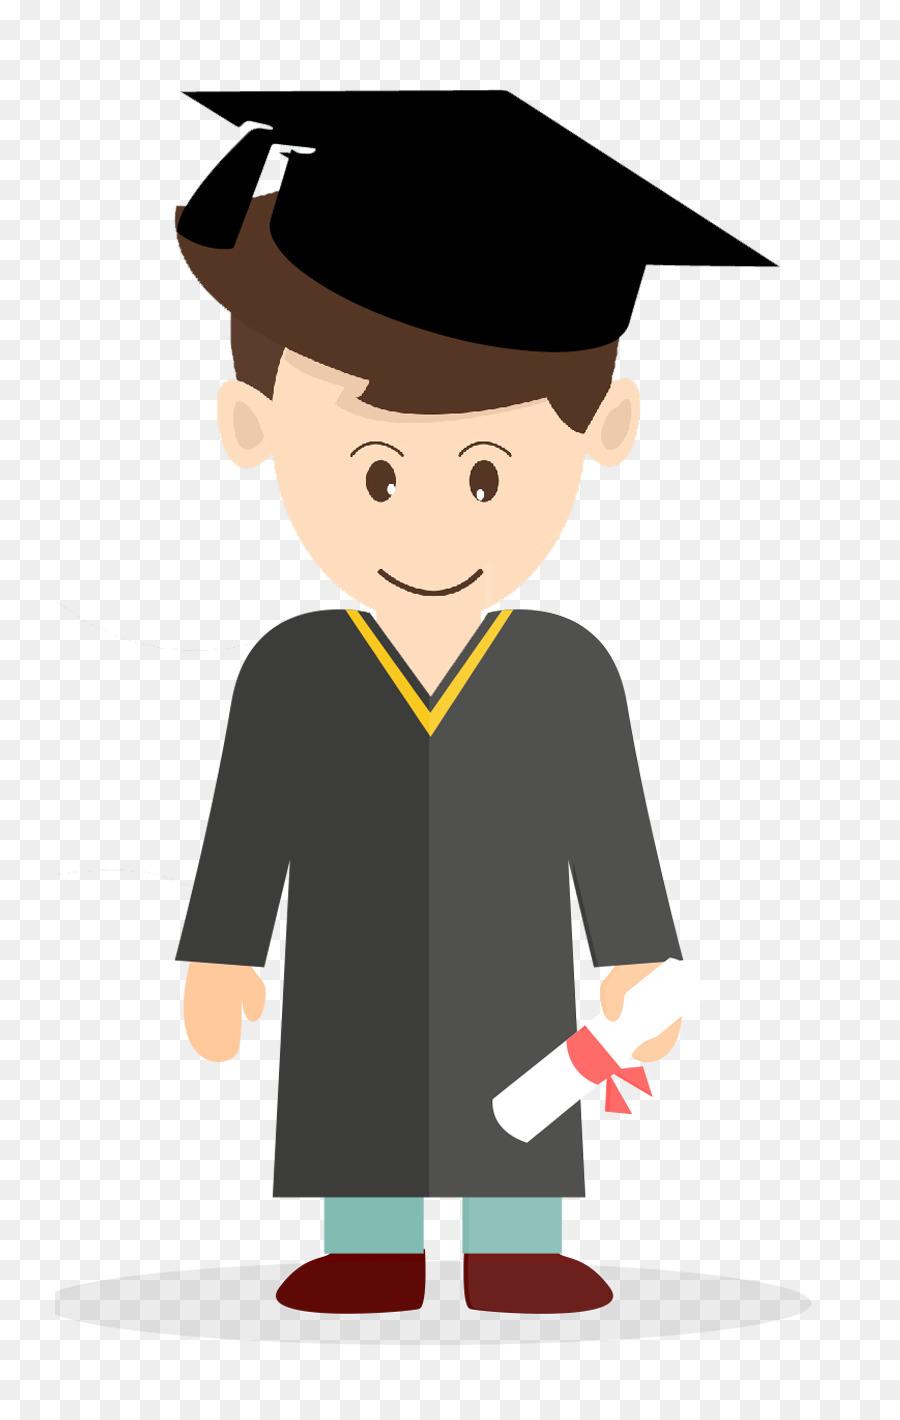 Graduation Vector Png : graduation, vector, Graduation, Cartoon, Download, 789*1409, Transparent, University, Colombia, Download., CleanPNG, KissPNG